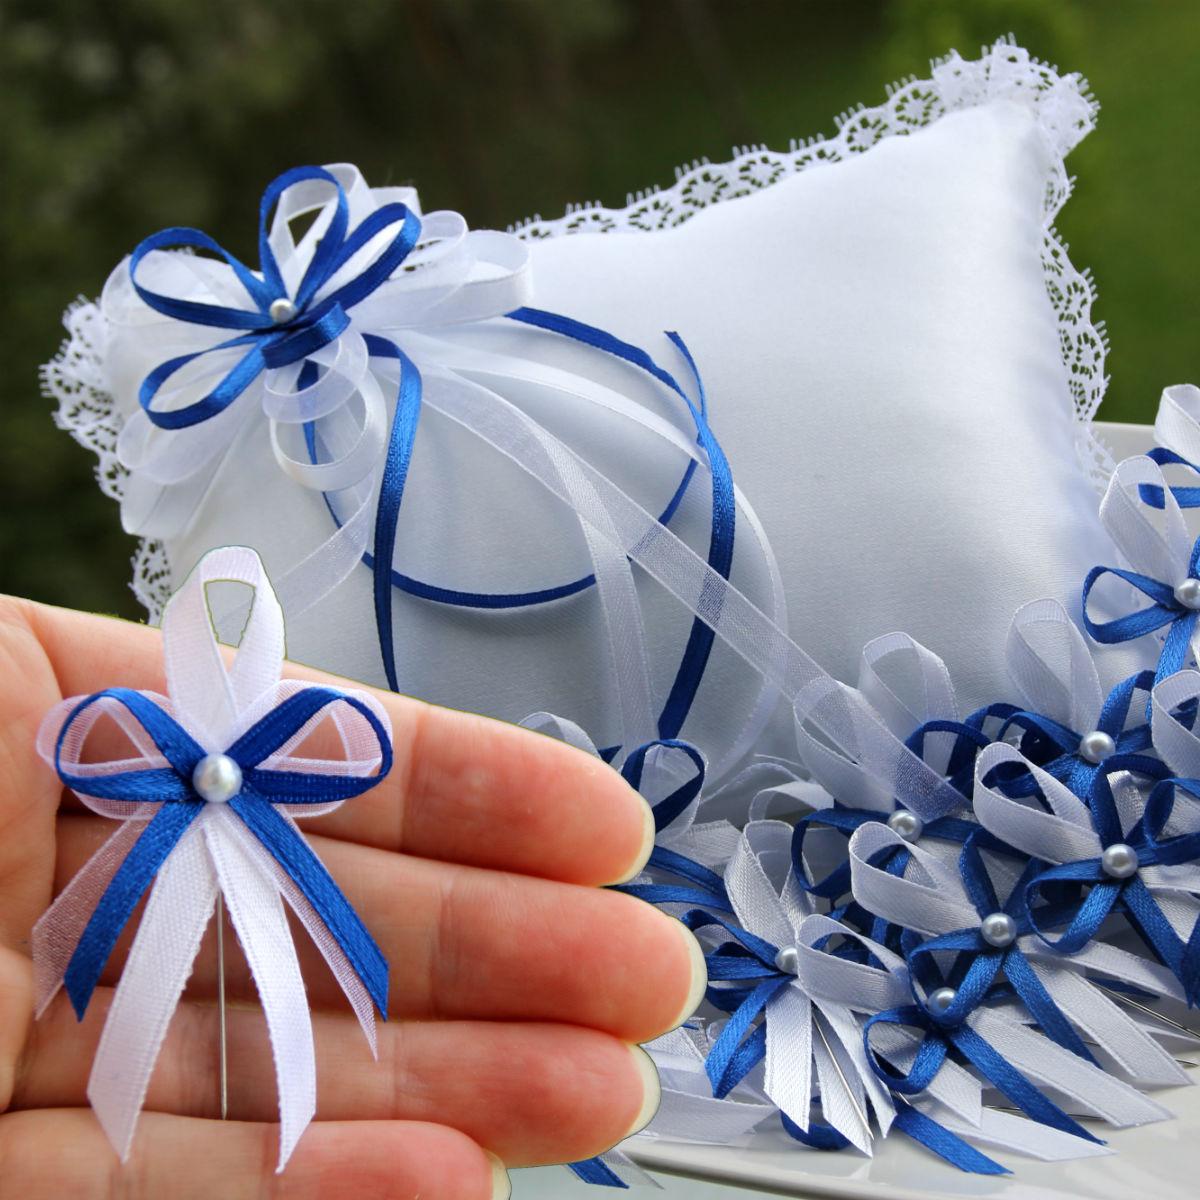 Svatebni Sada Modra Kralovska Polstarek Vyvazky Zakladni Sada 1